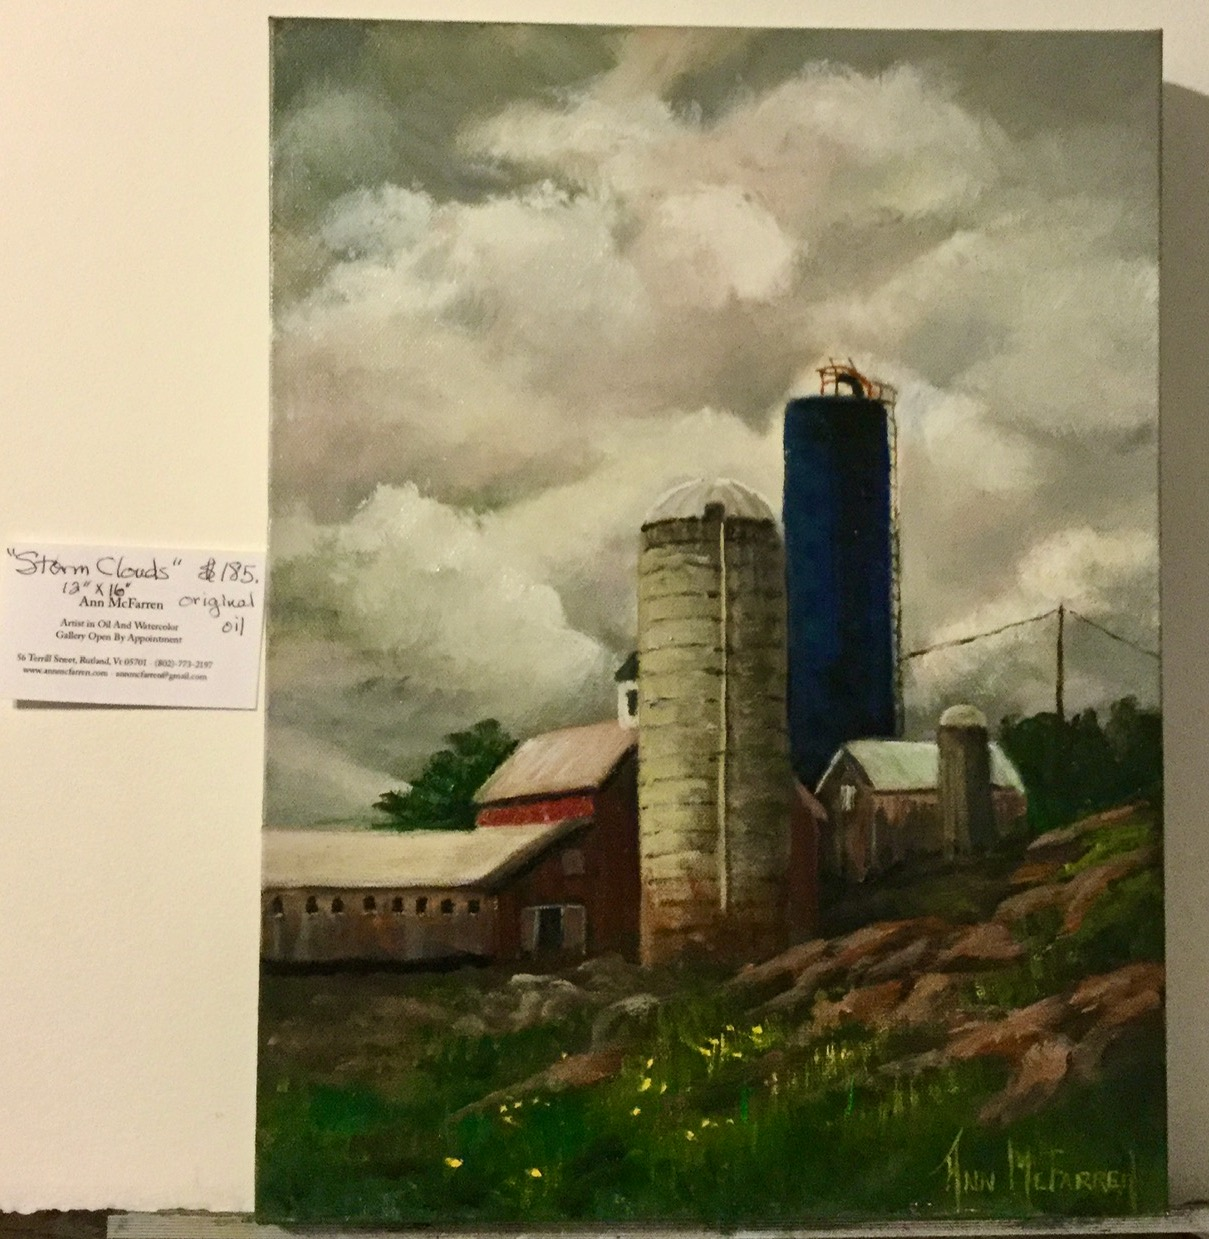 "$185 - Storm Clouds - 12""x16"""